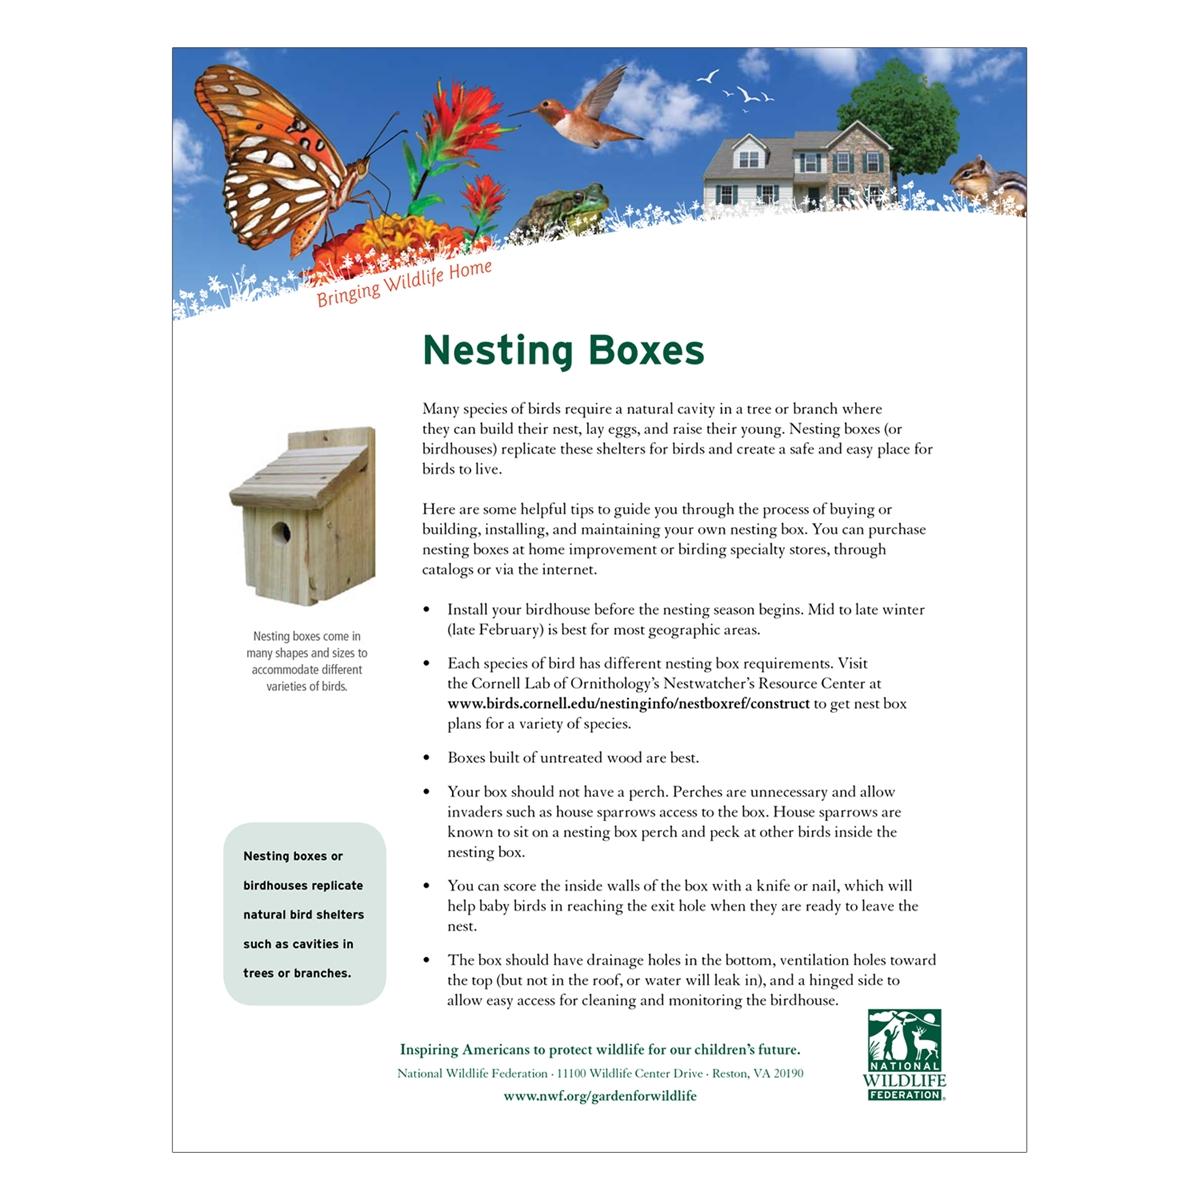 Nesting Boxes Tip Sheet